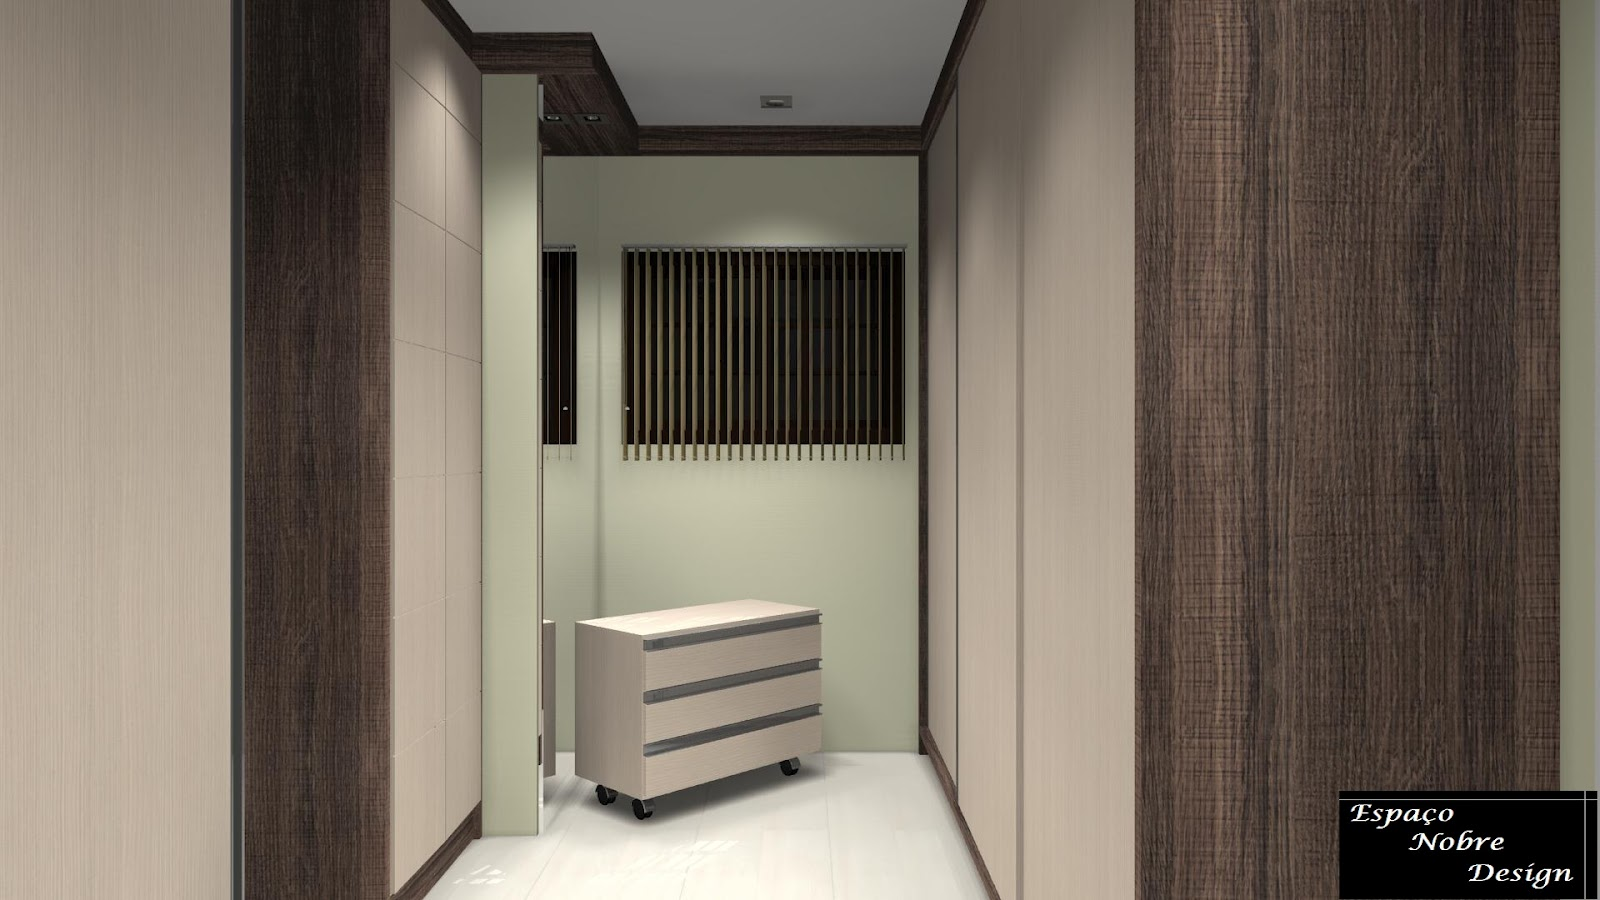 Espa o nobre design dormit rio de casal c closet for Closet rusticos